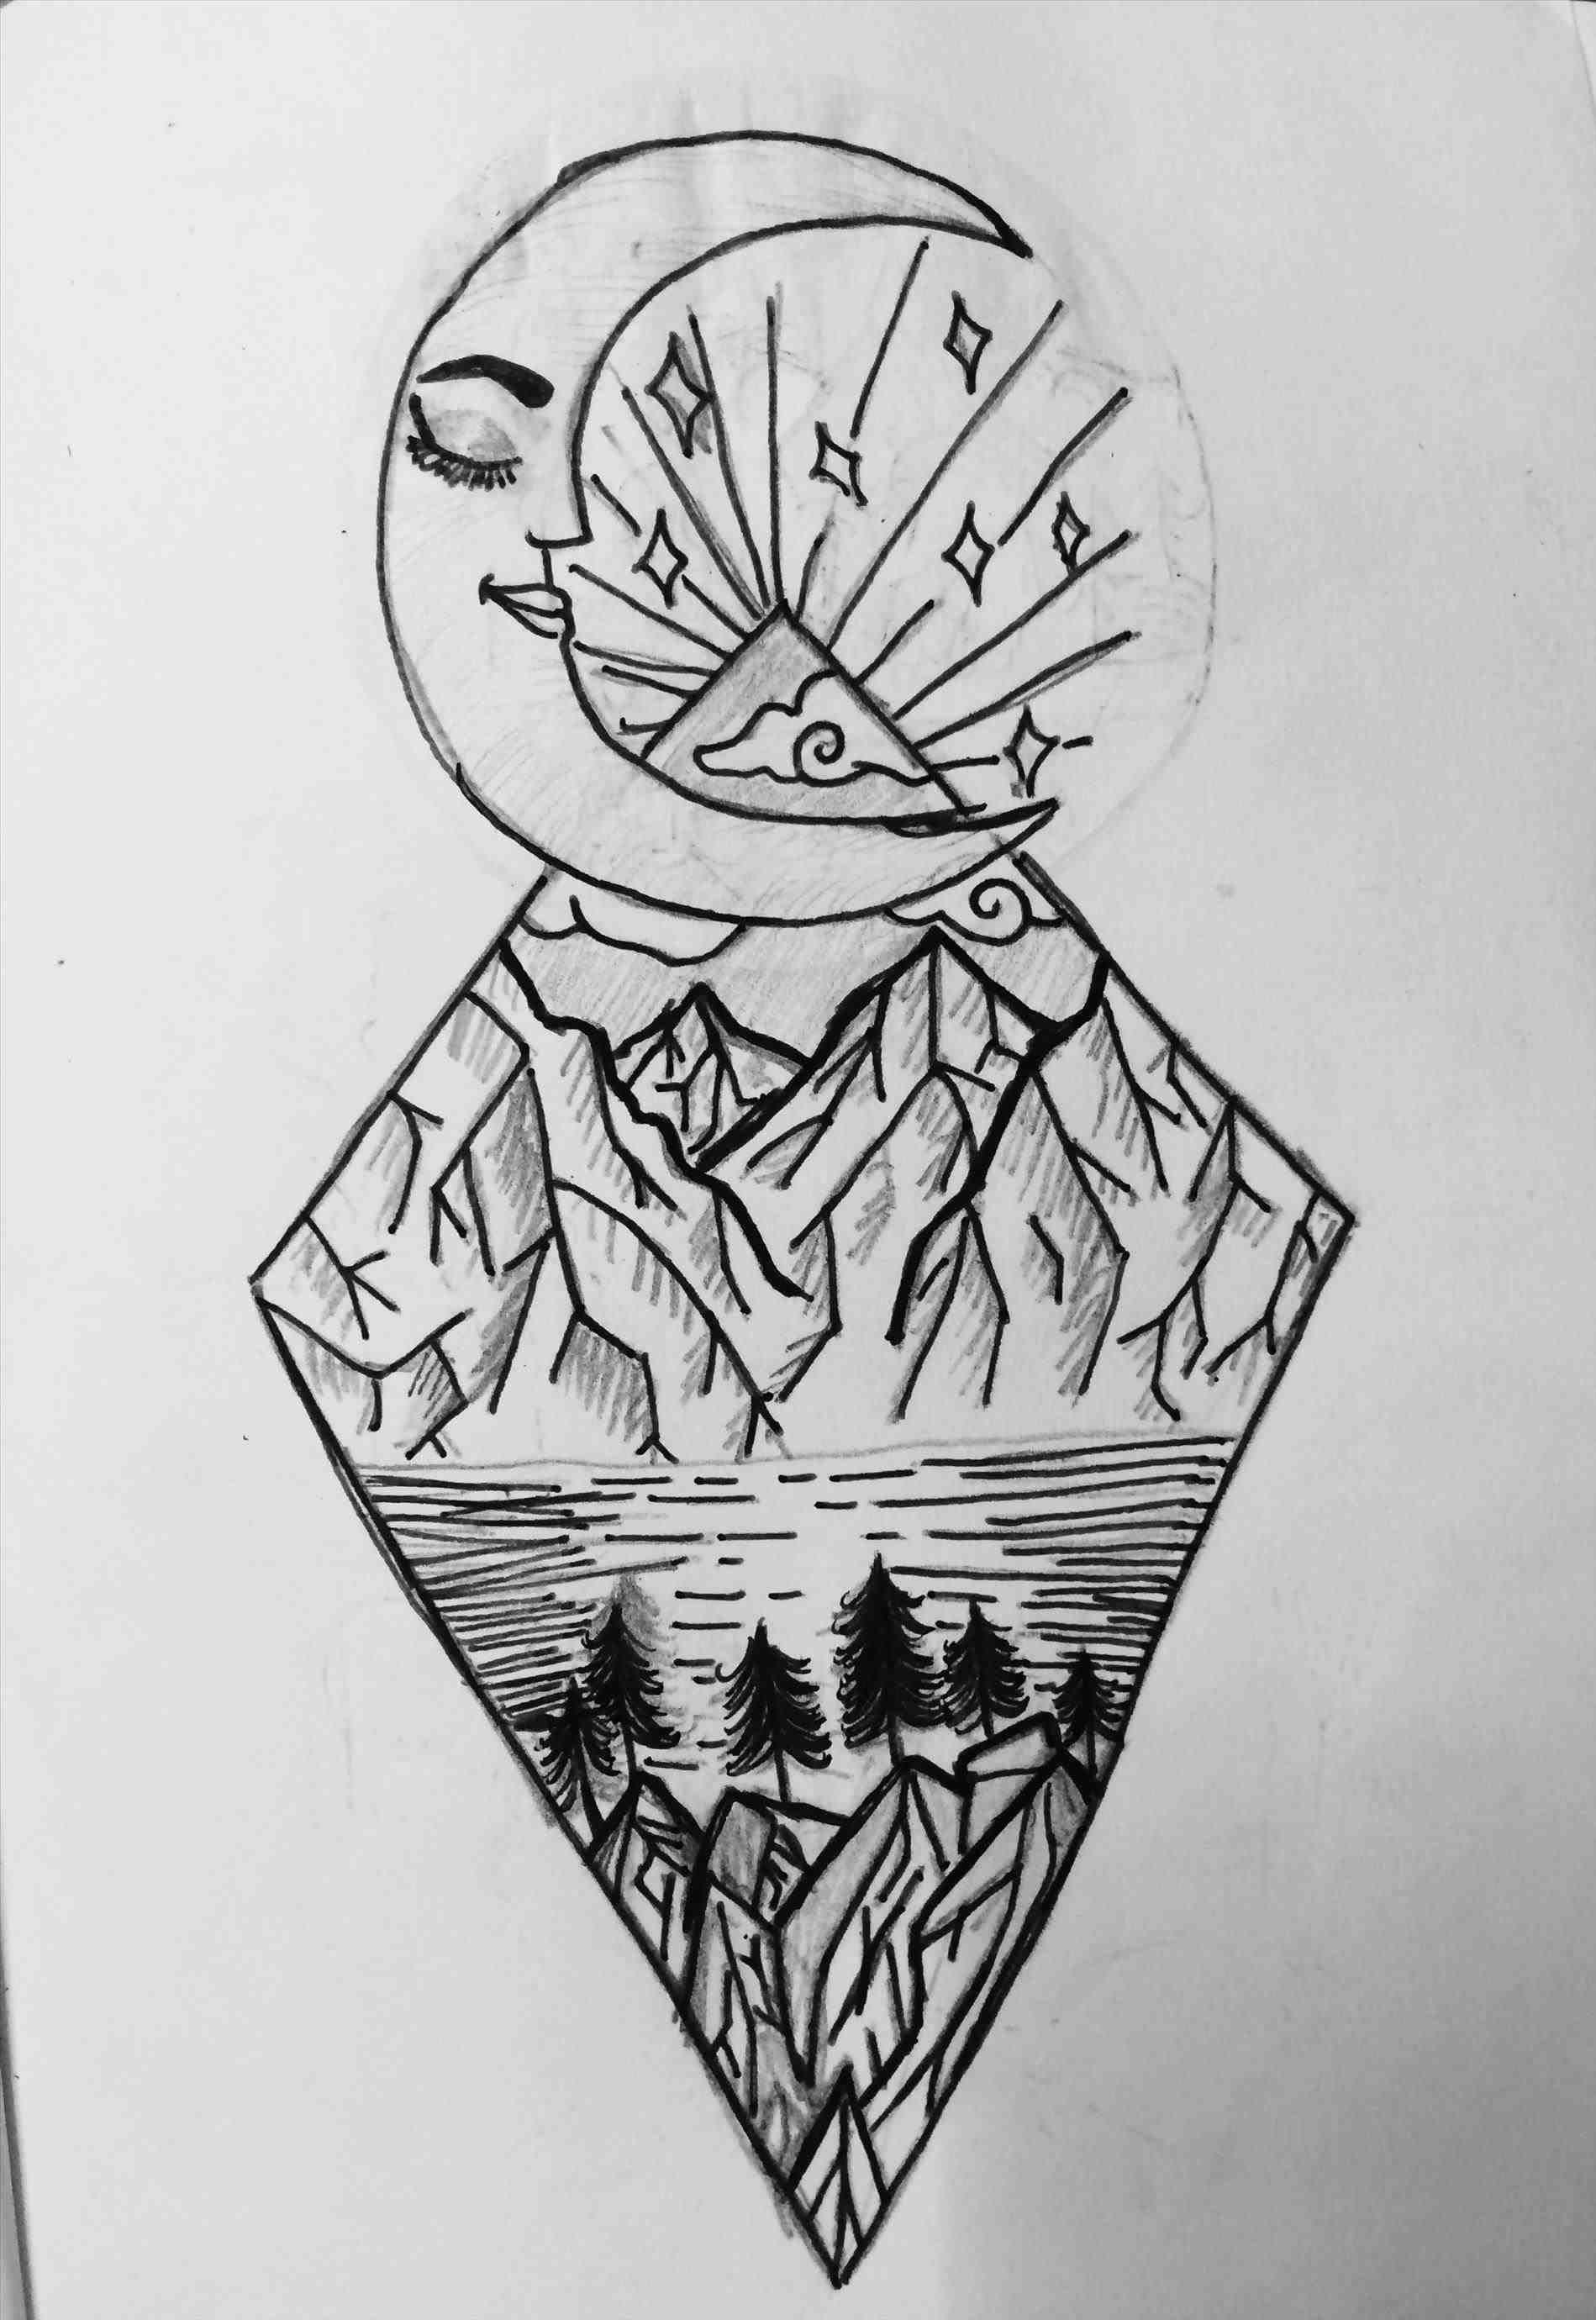 Imagenes Tumblr Para Dibujar Buscar Con Google Lindos Dibujos